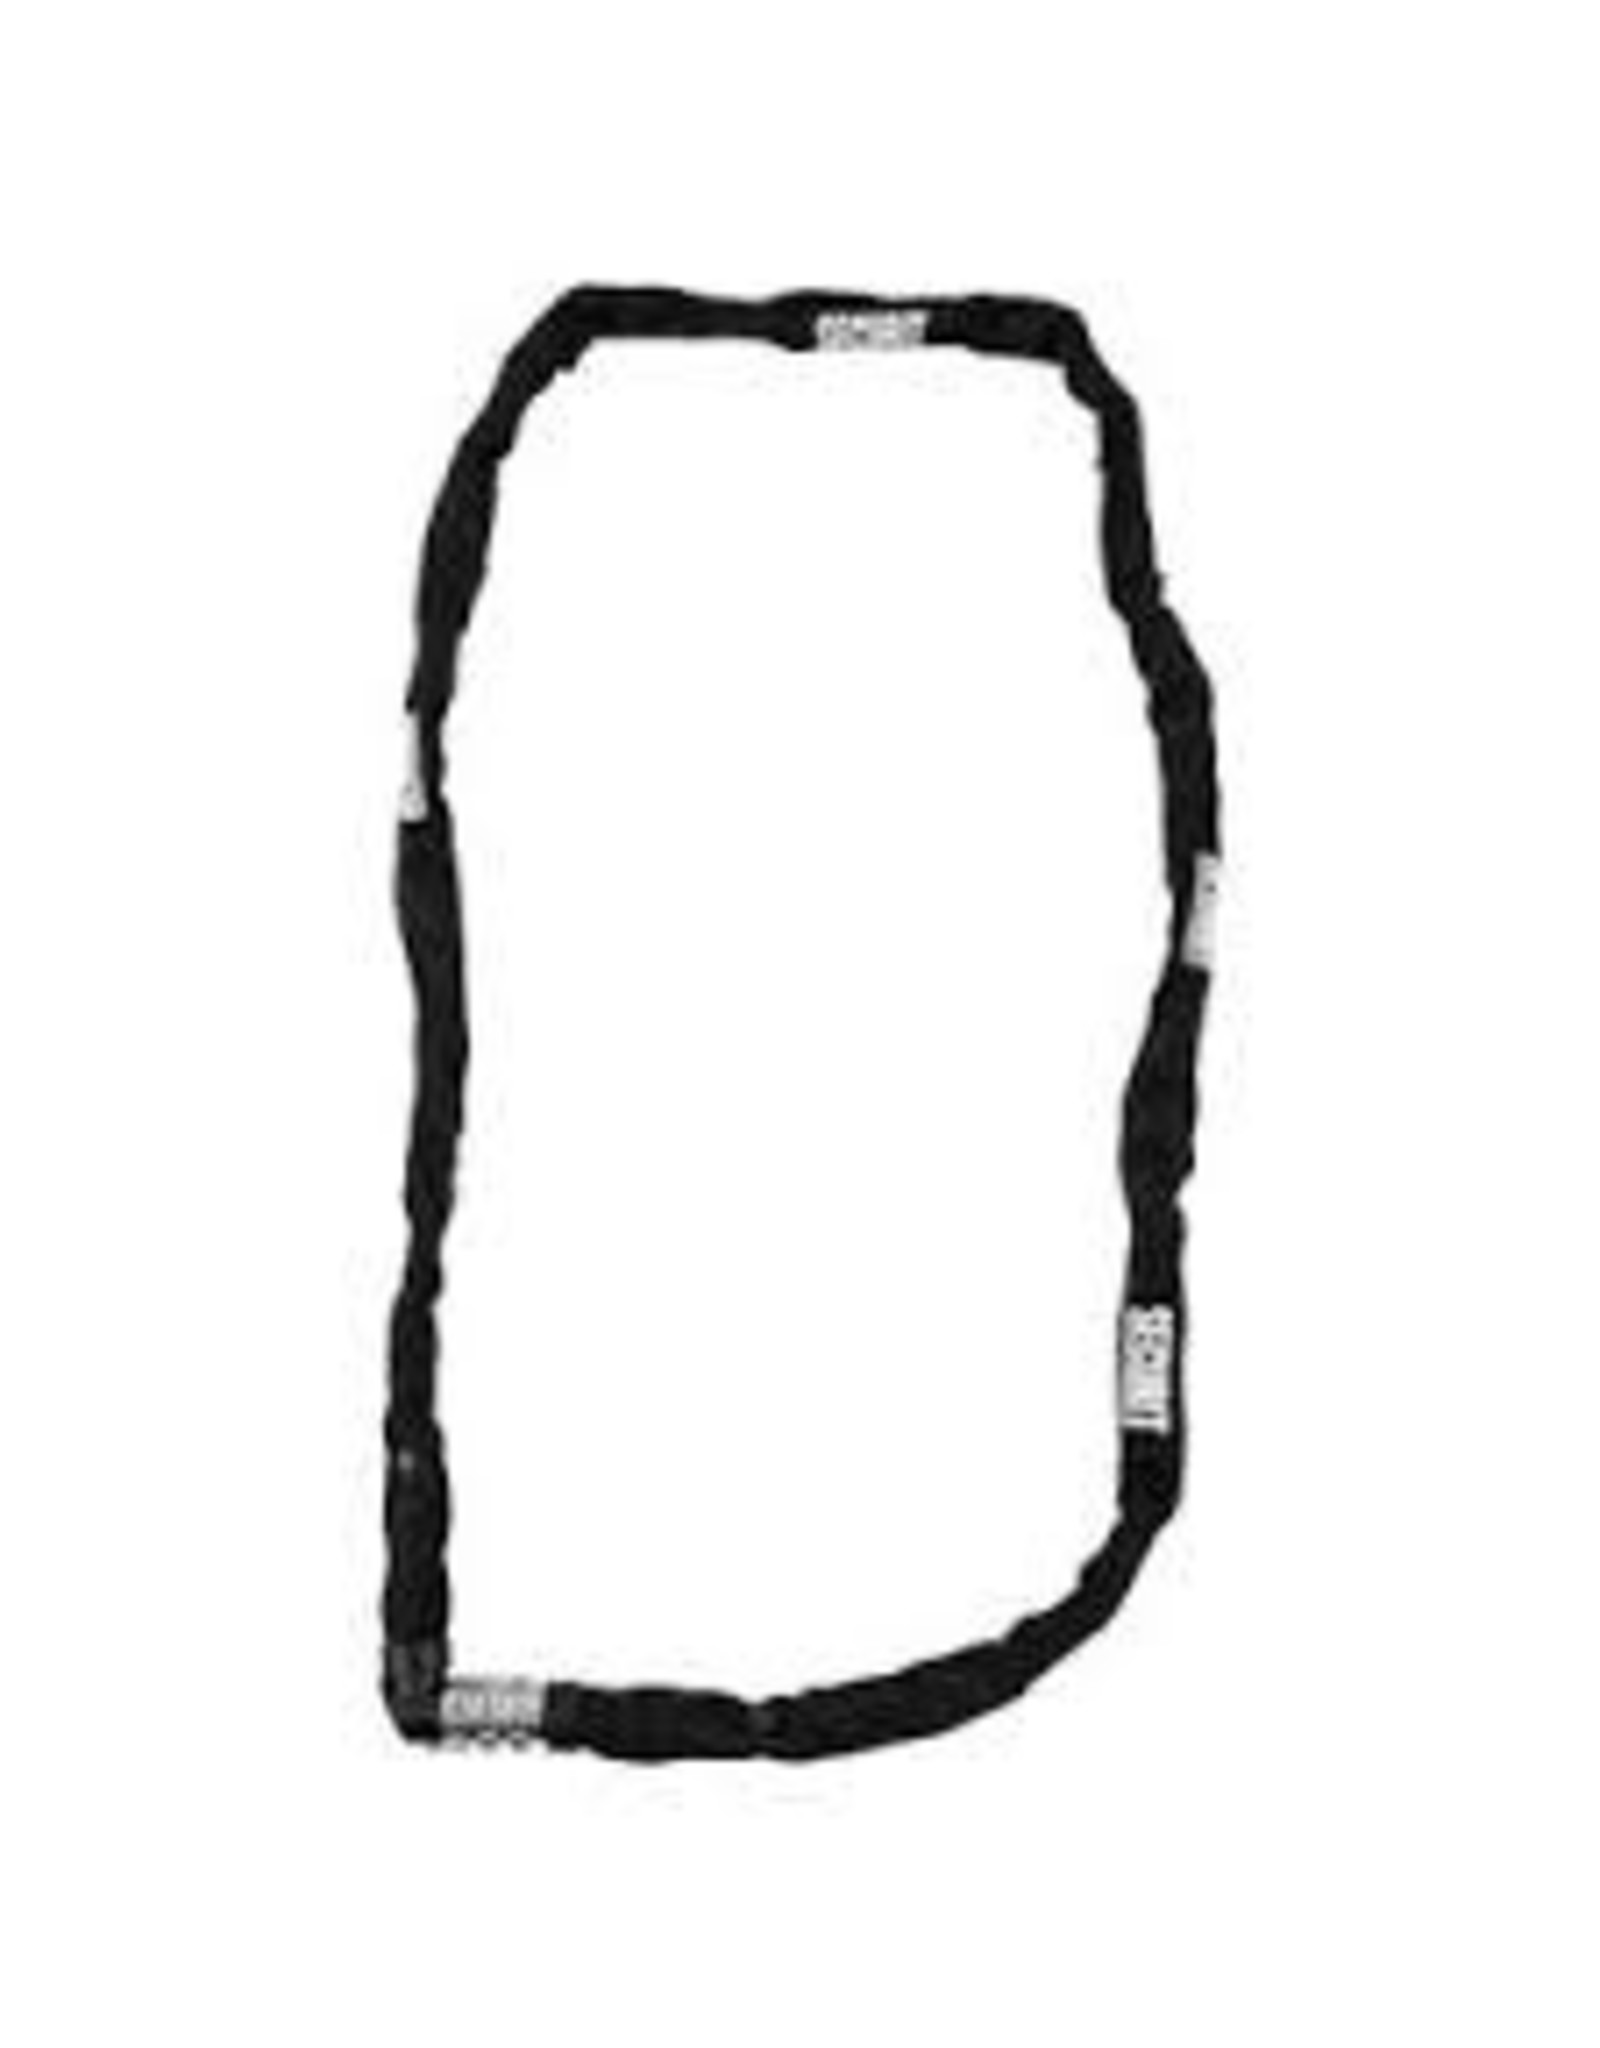 SECURIT Lock Jackie Chain Key 4x110cm Black